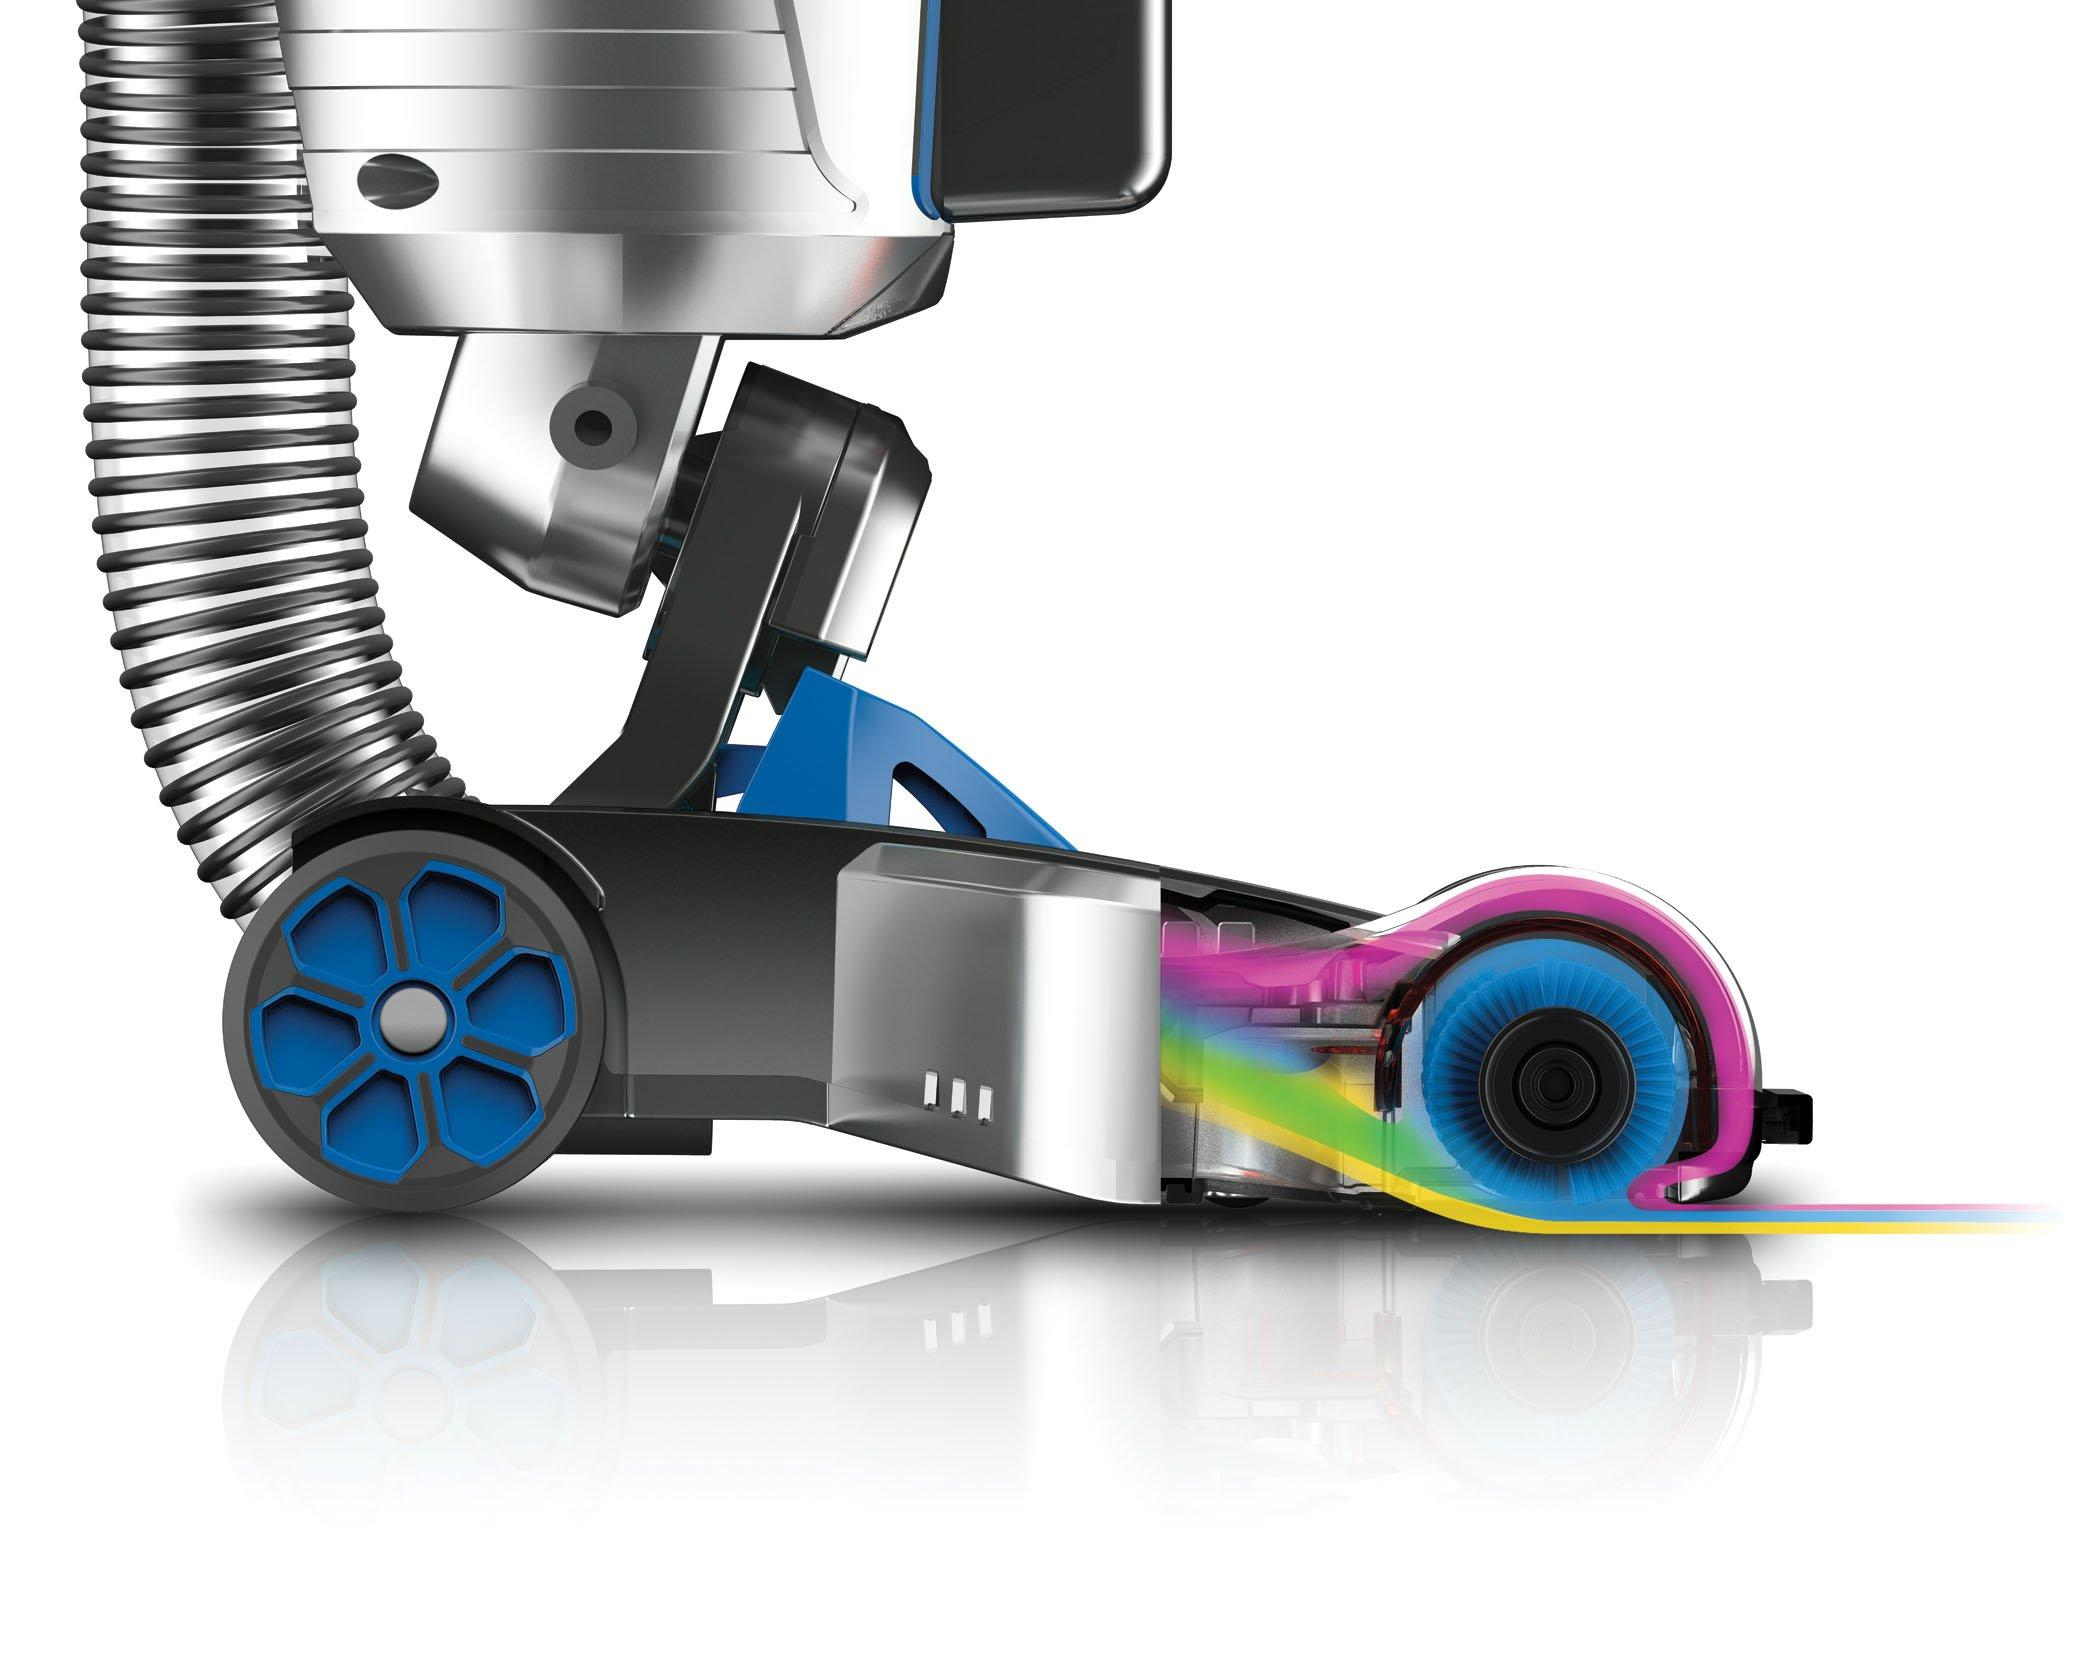 Air Cordless Deluxe Upright Vacuum with Bonus Tools3